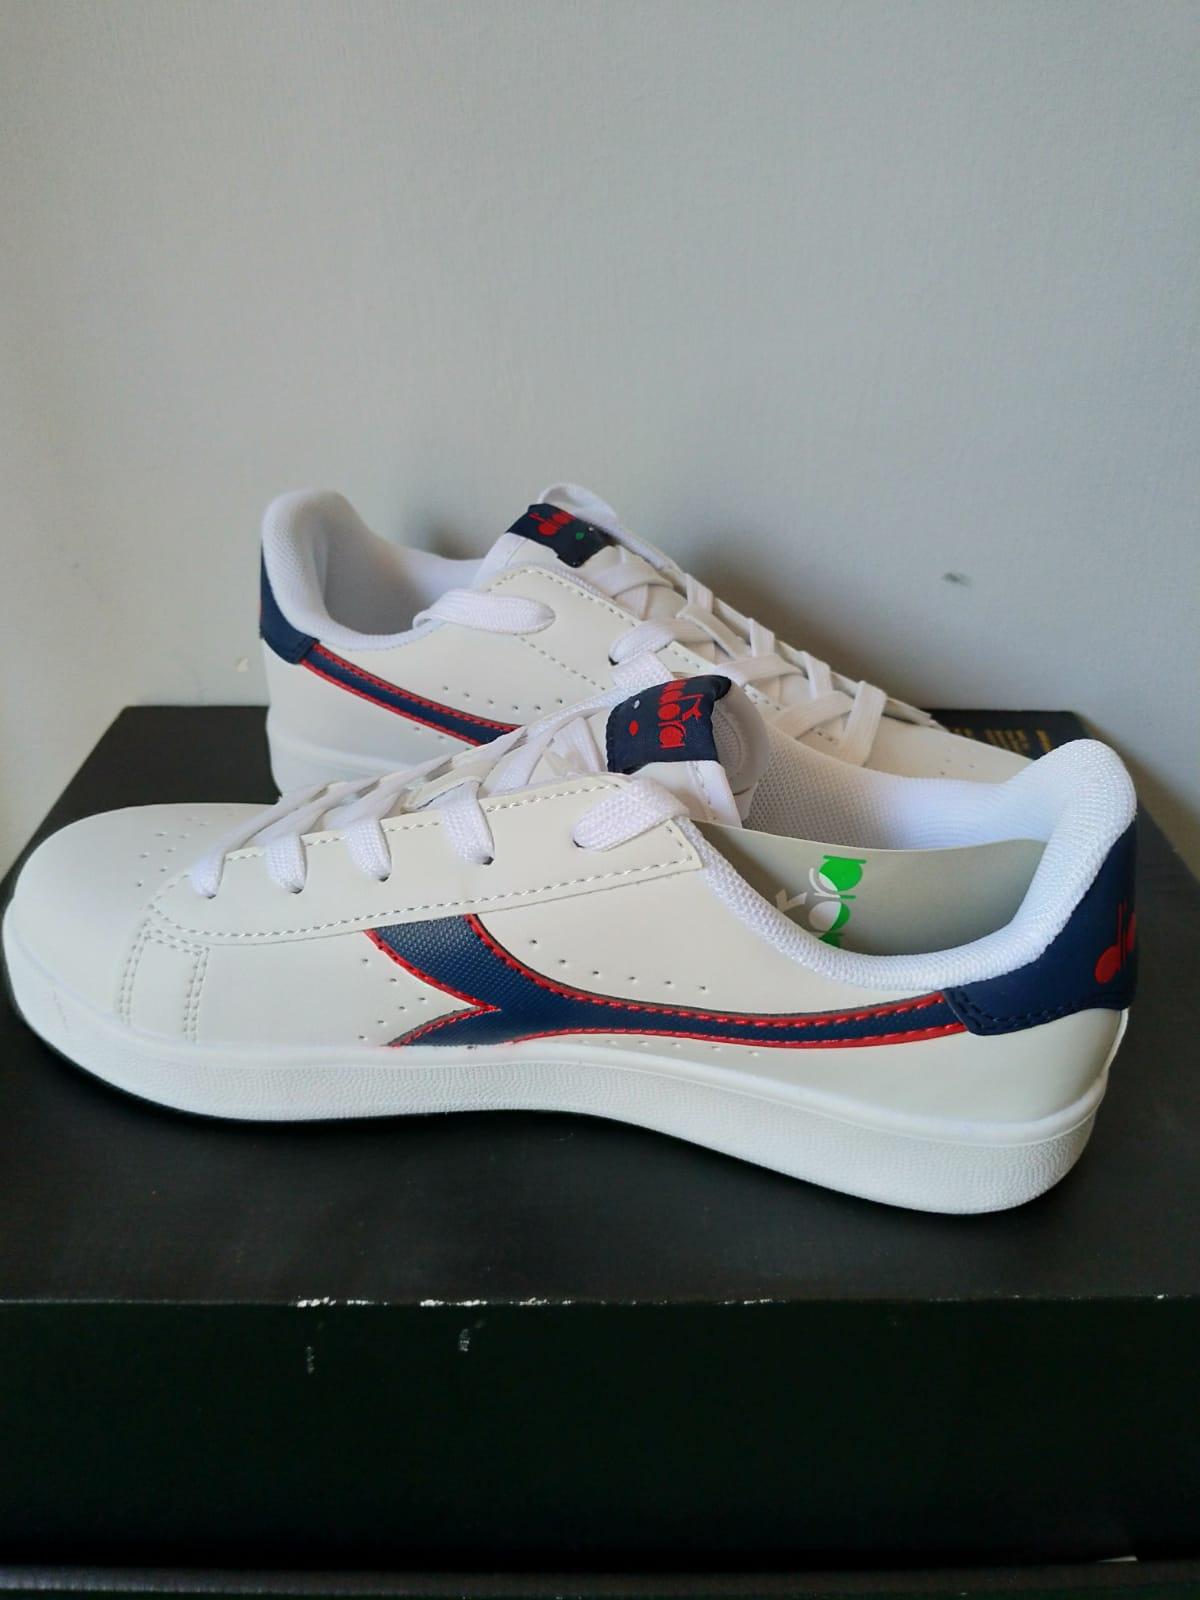 Diadora Scarpe Sportive Sneakers game Bambino Donna p gs Sportswear ... e97390f02b1